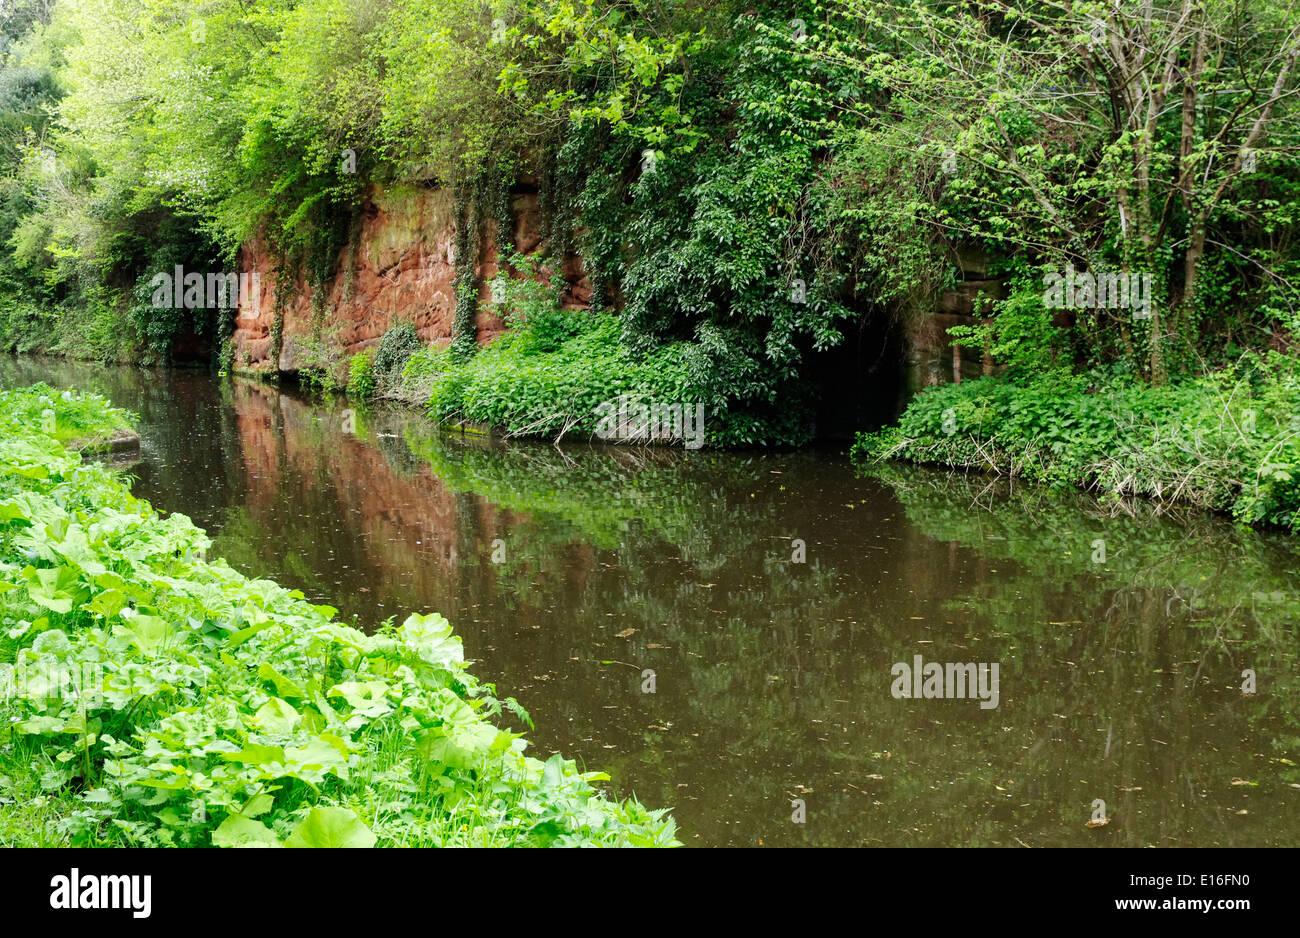 Devil's Den Sandstone Escarpment on the Staffordshire & Worcestershire Canal, Prestwood, Staffordshire, England, Stock Photo